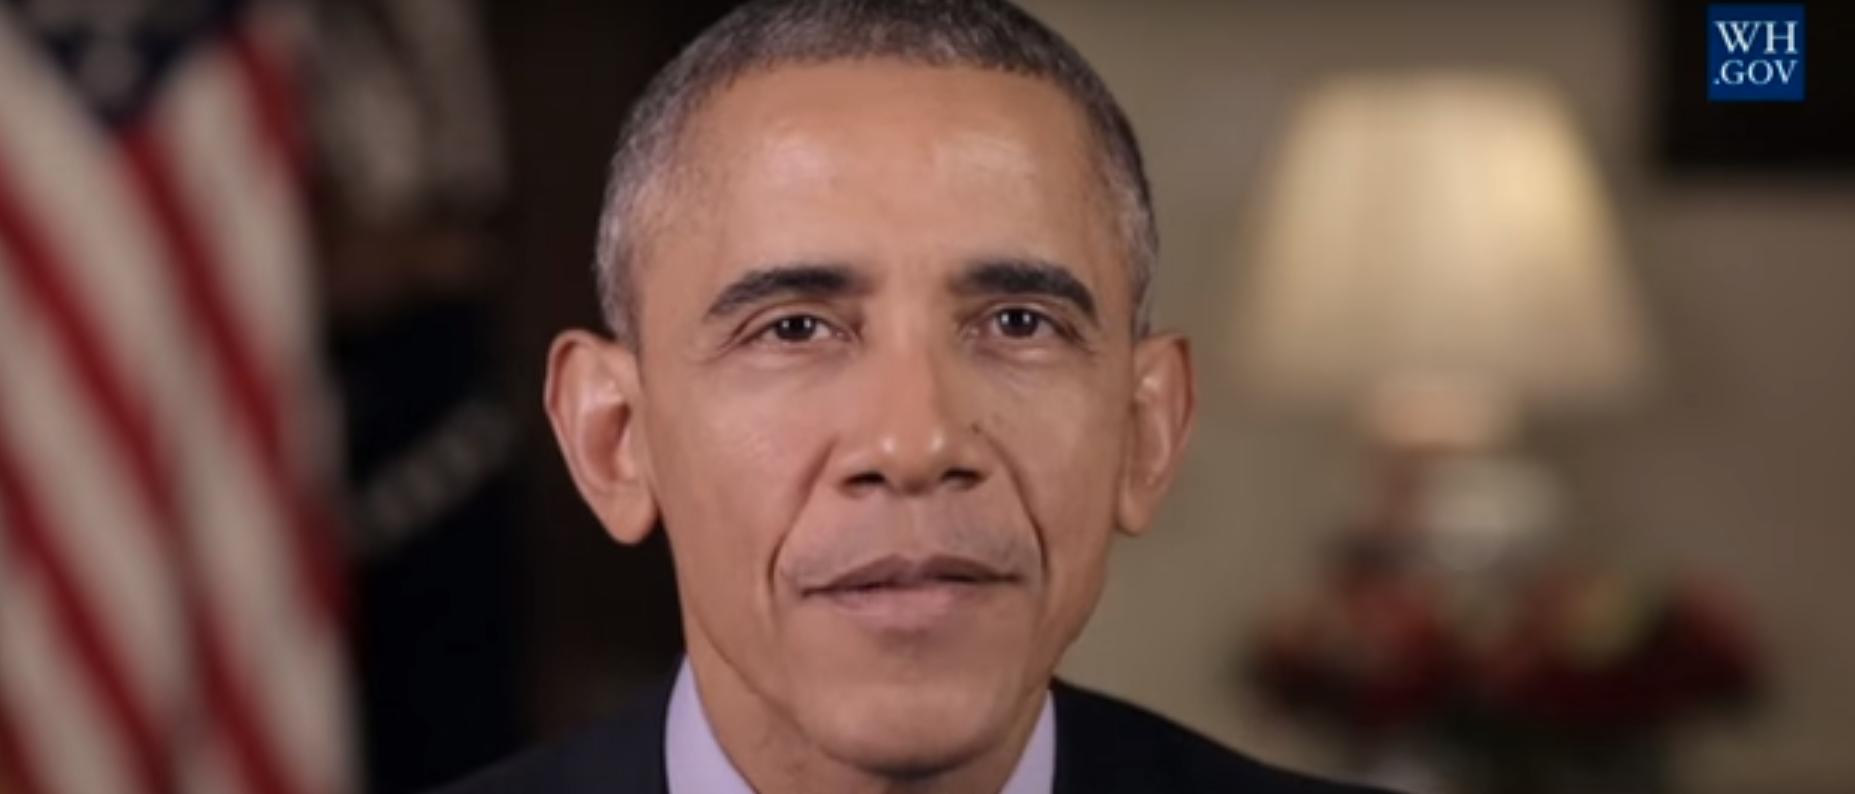 President Barack Obama in White House New Year address 2016